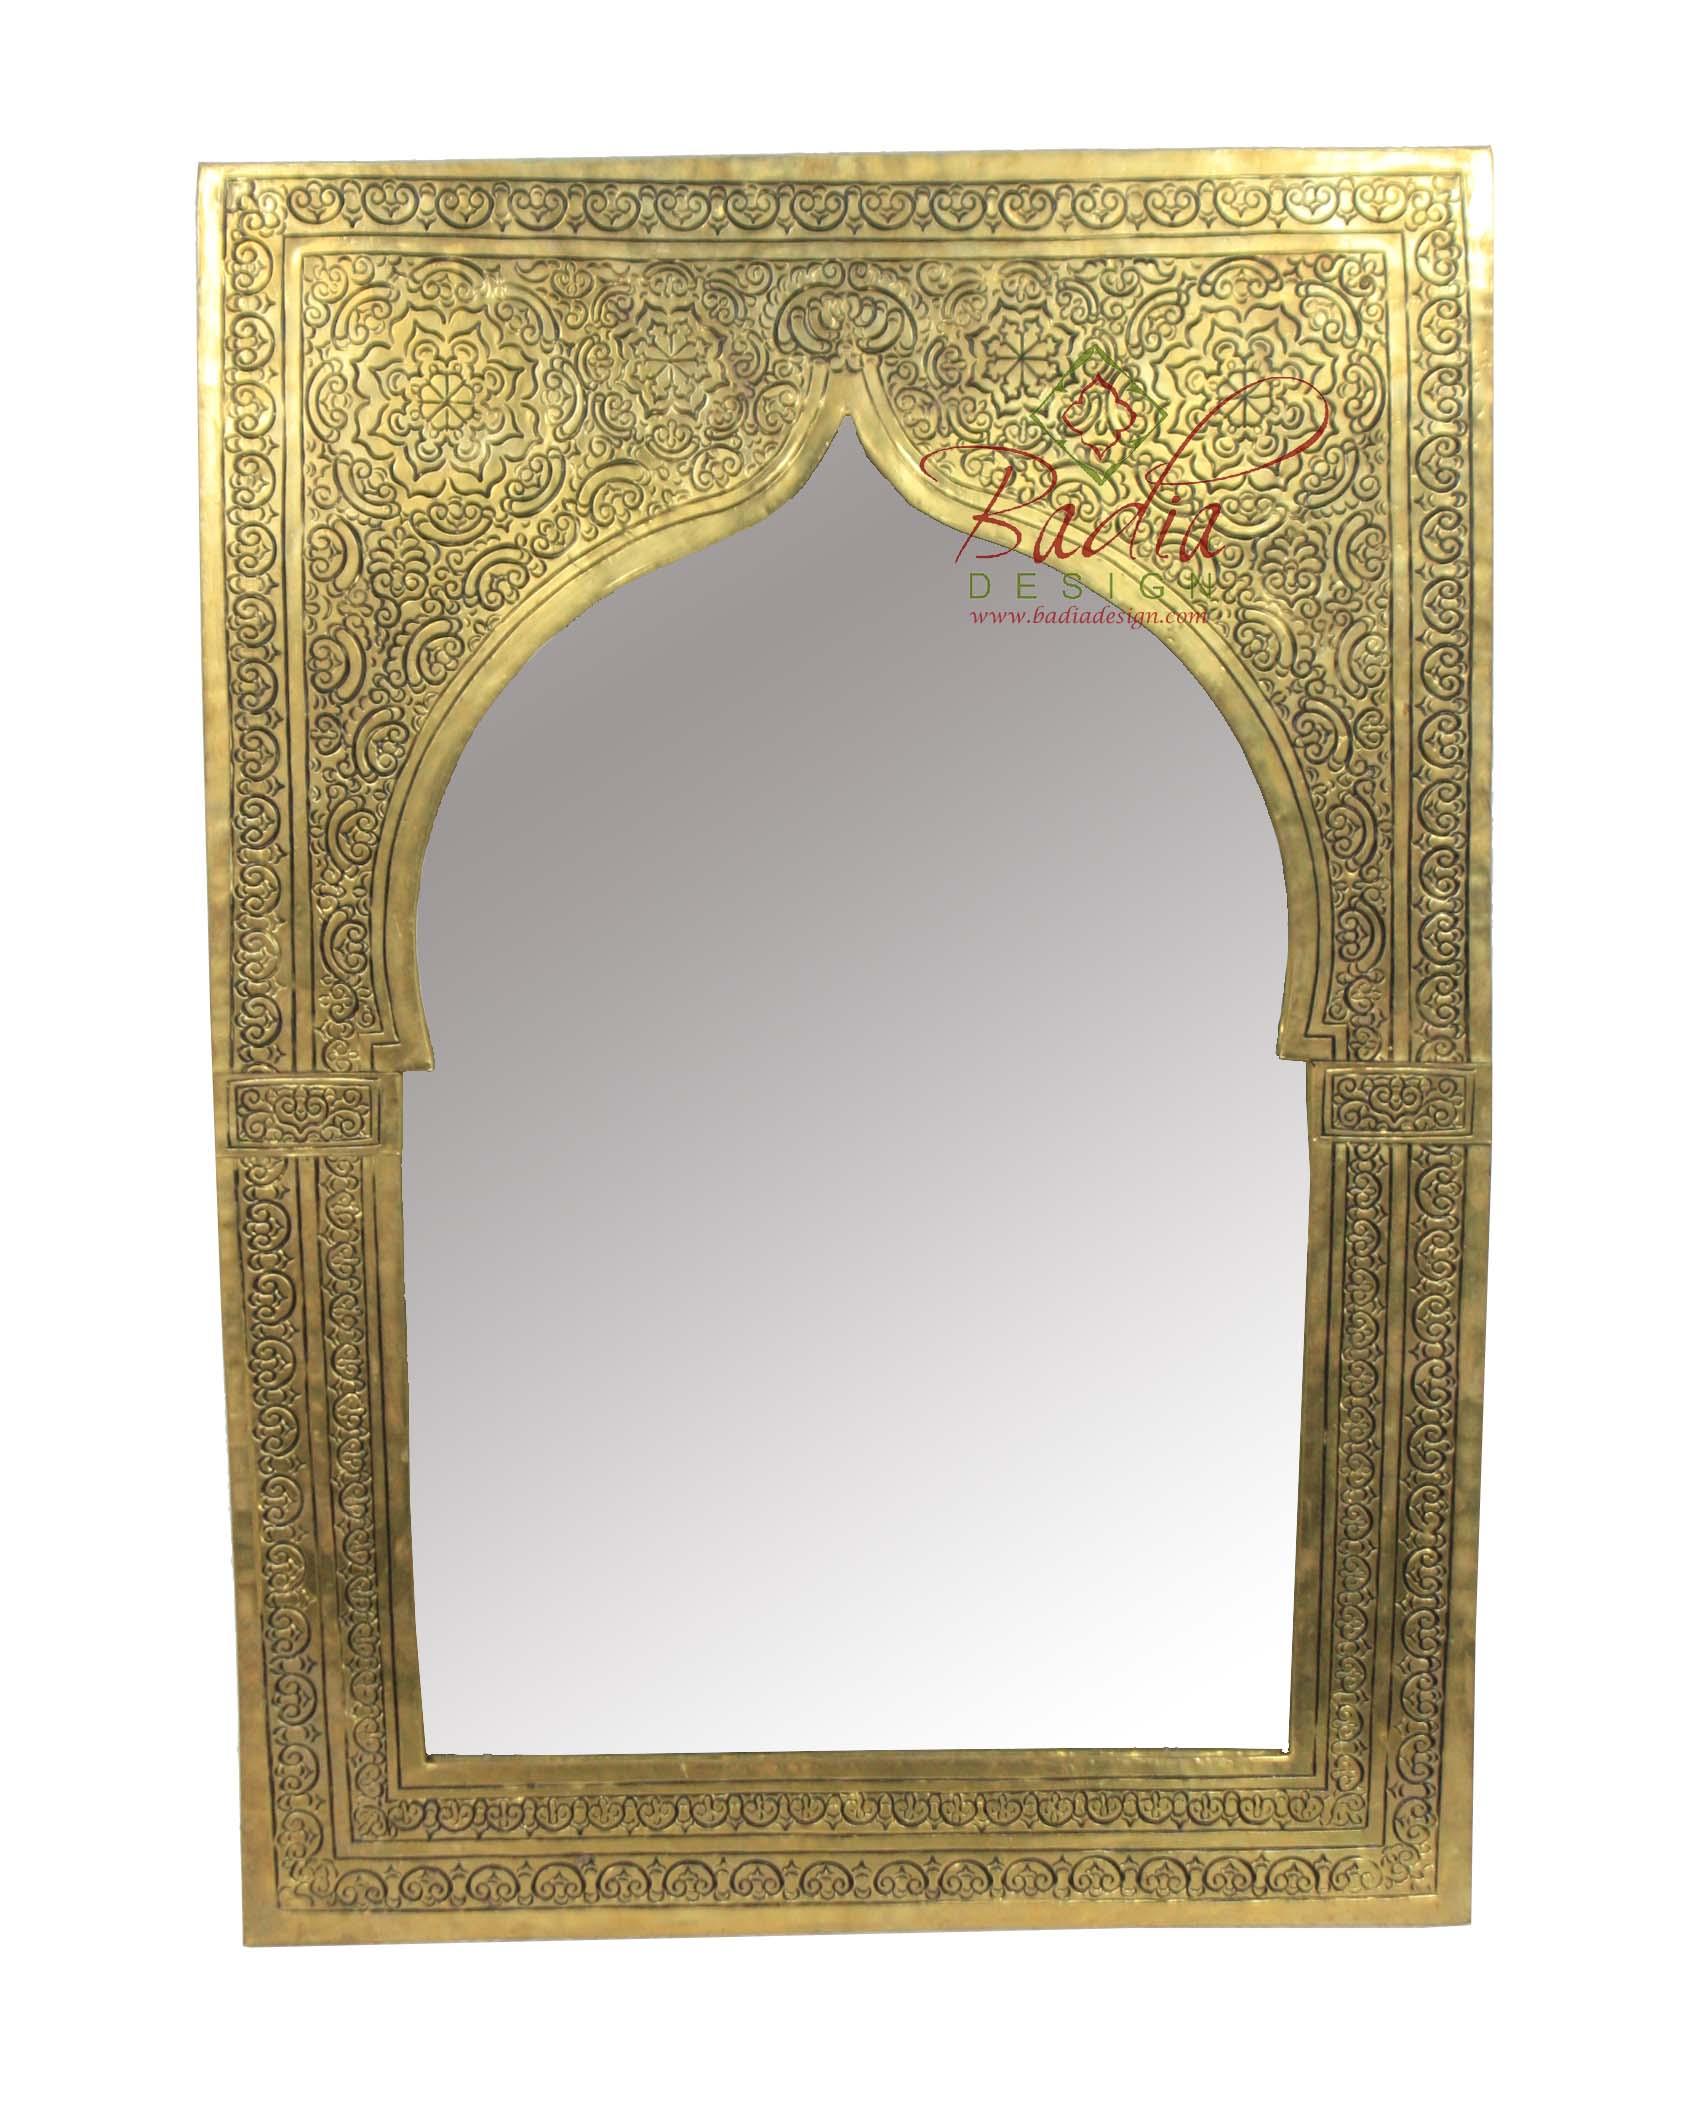 moroccan-brass-frame-mirror-m-em007.jpg